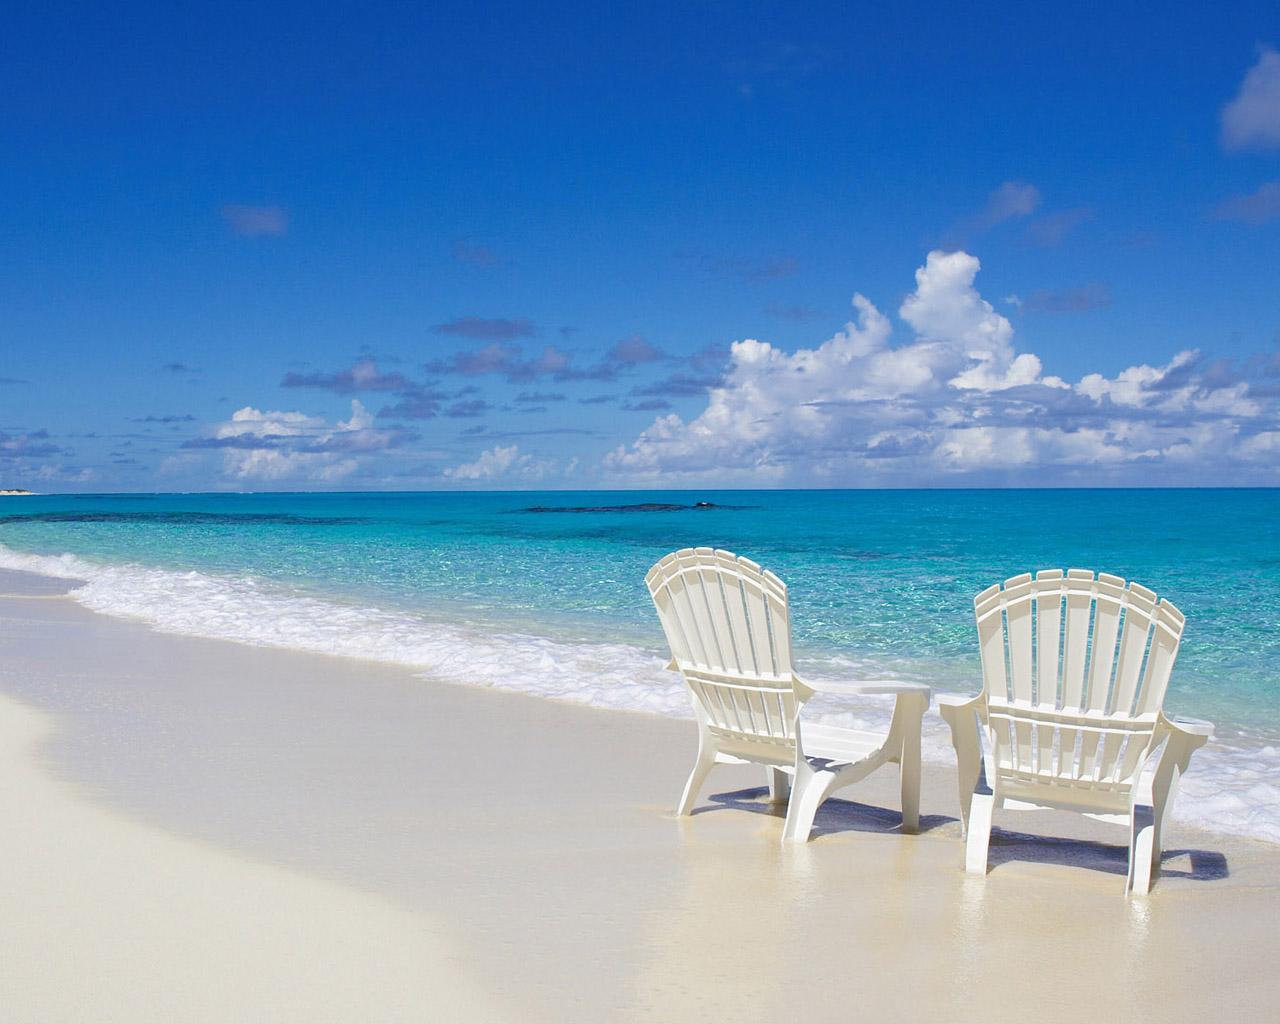 Beautiful Beach 1280x1024 WallpapersTurks and Caicos Islands 1280x1024